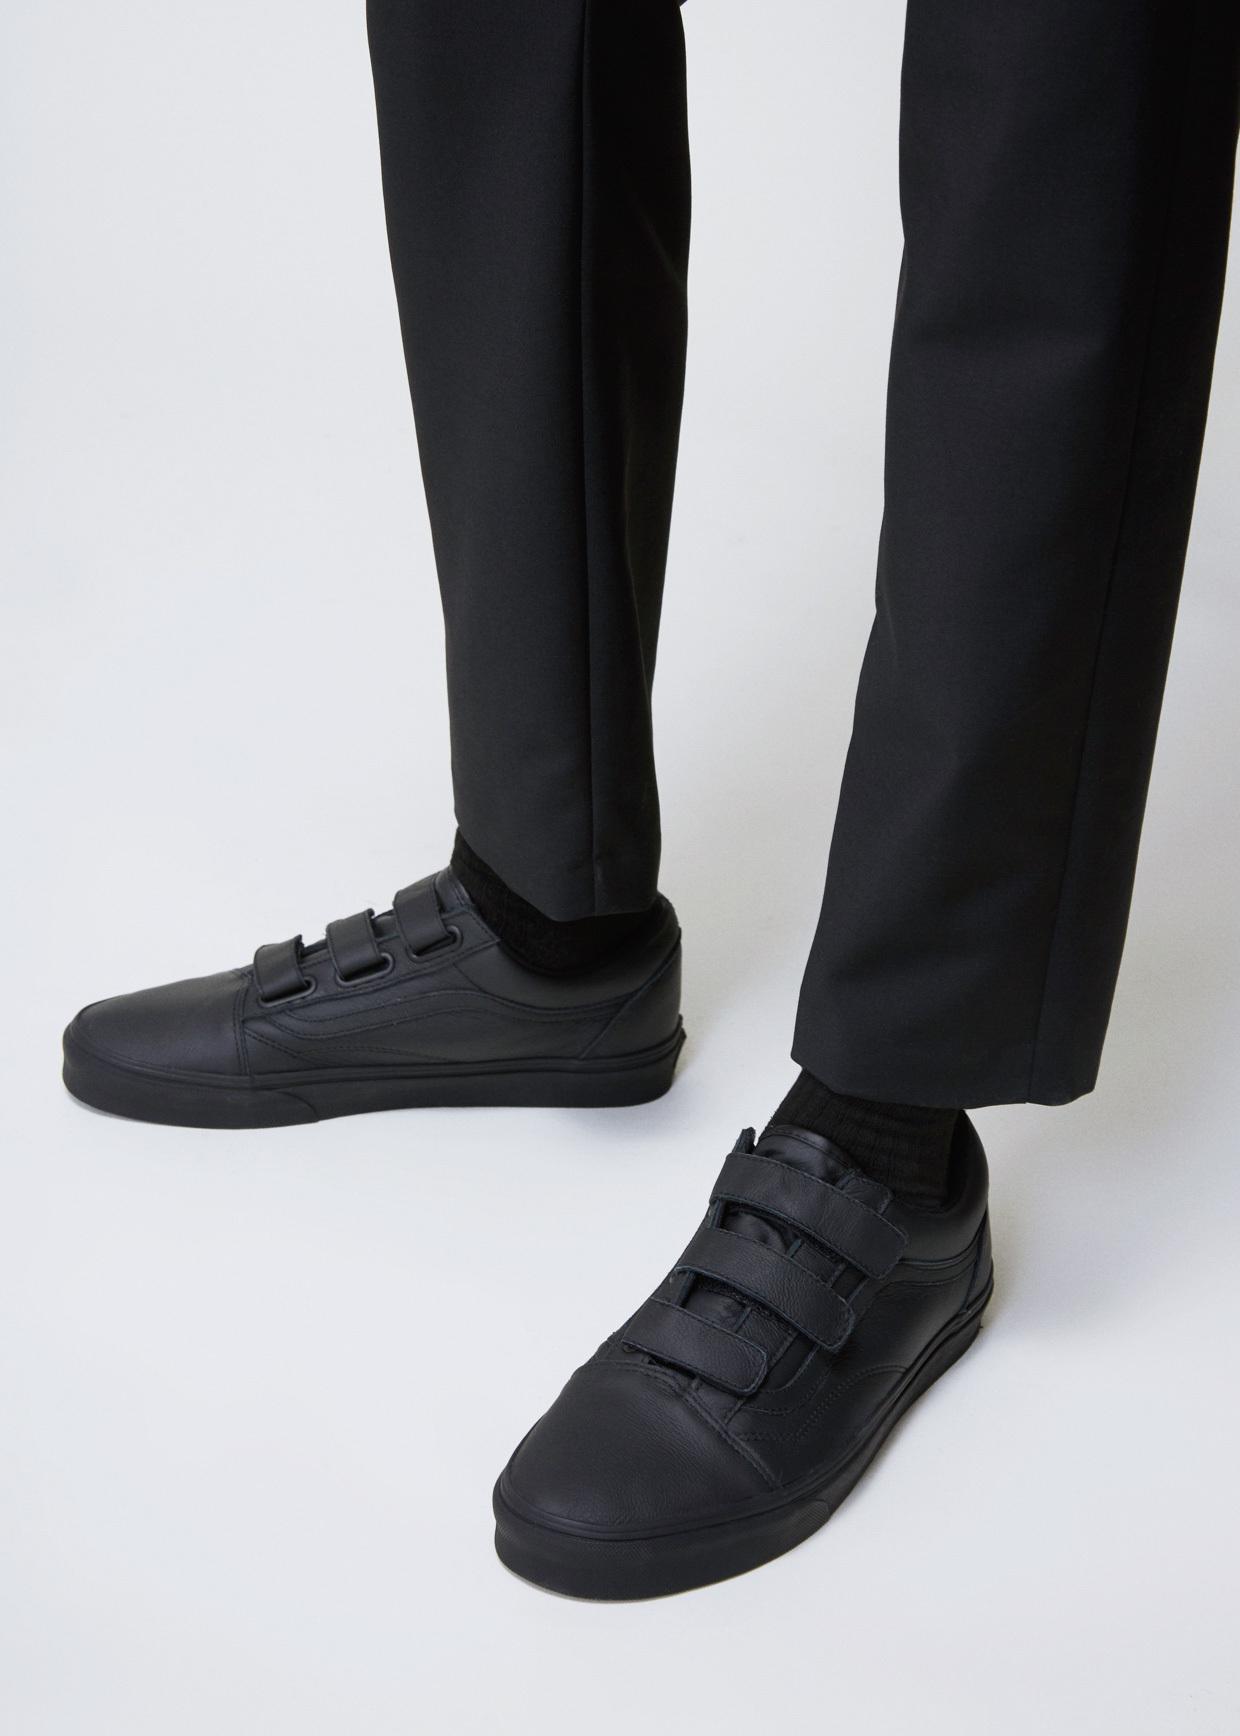 Lyst - Vans Mono Black Ua Old Skool V Sneaker in Black for Men 9fa405fea